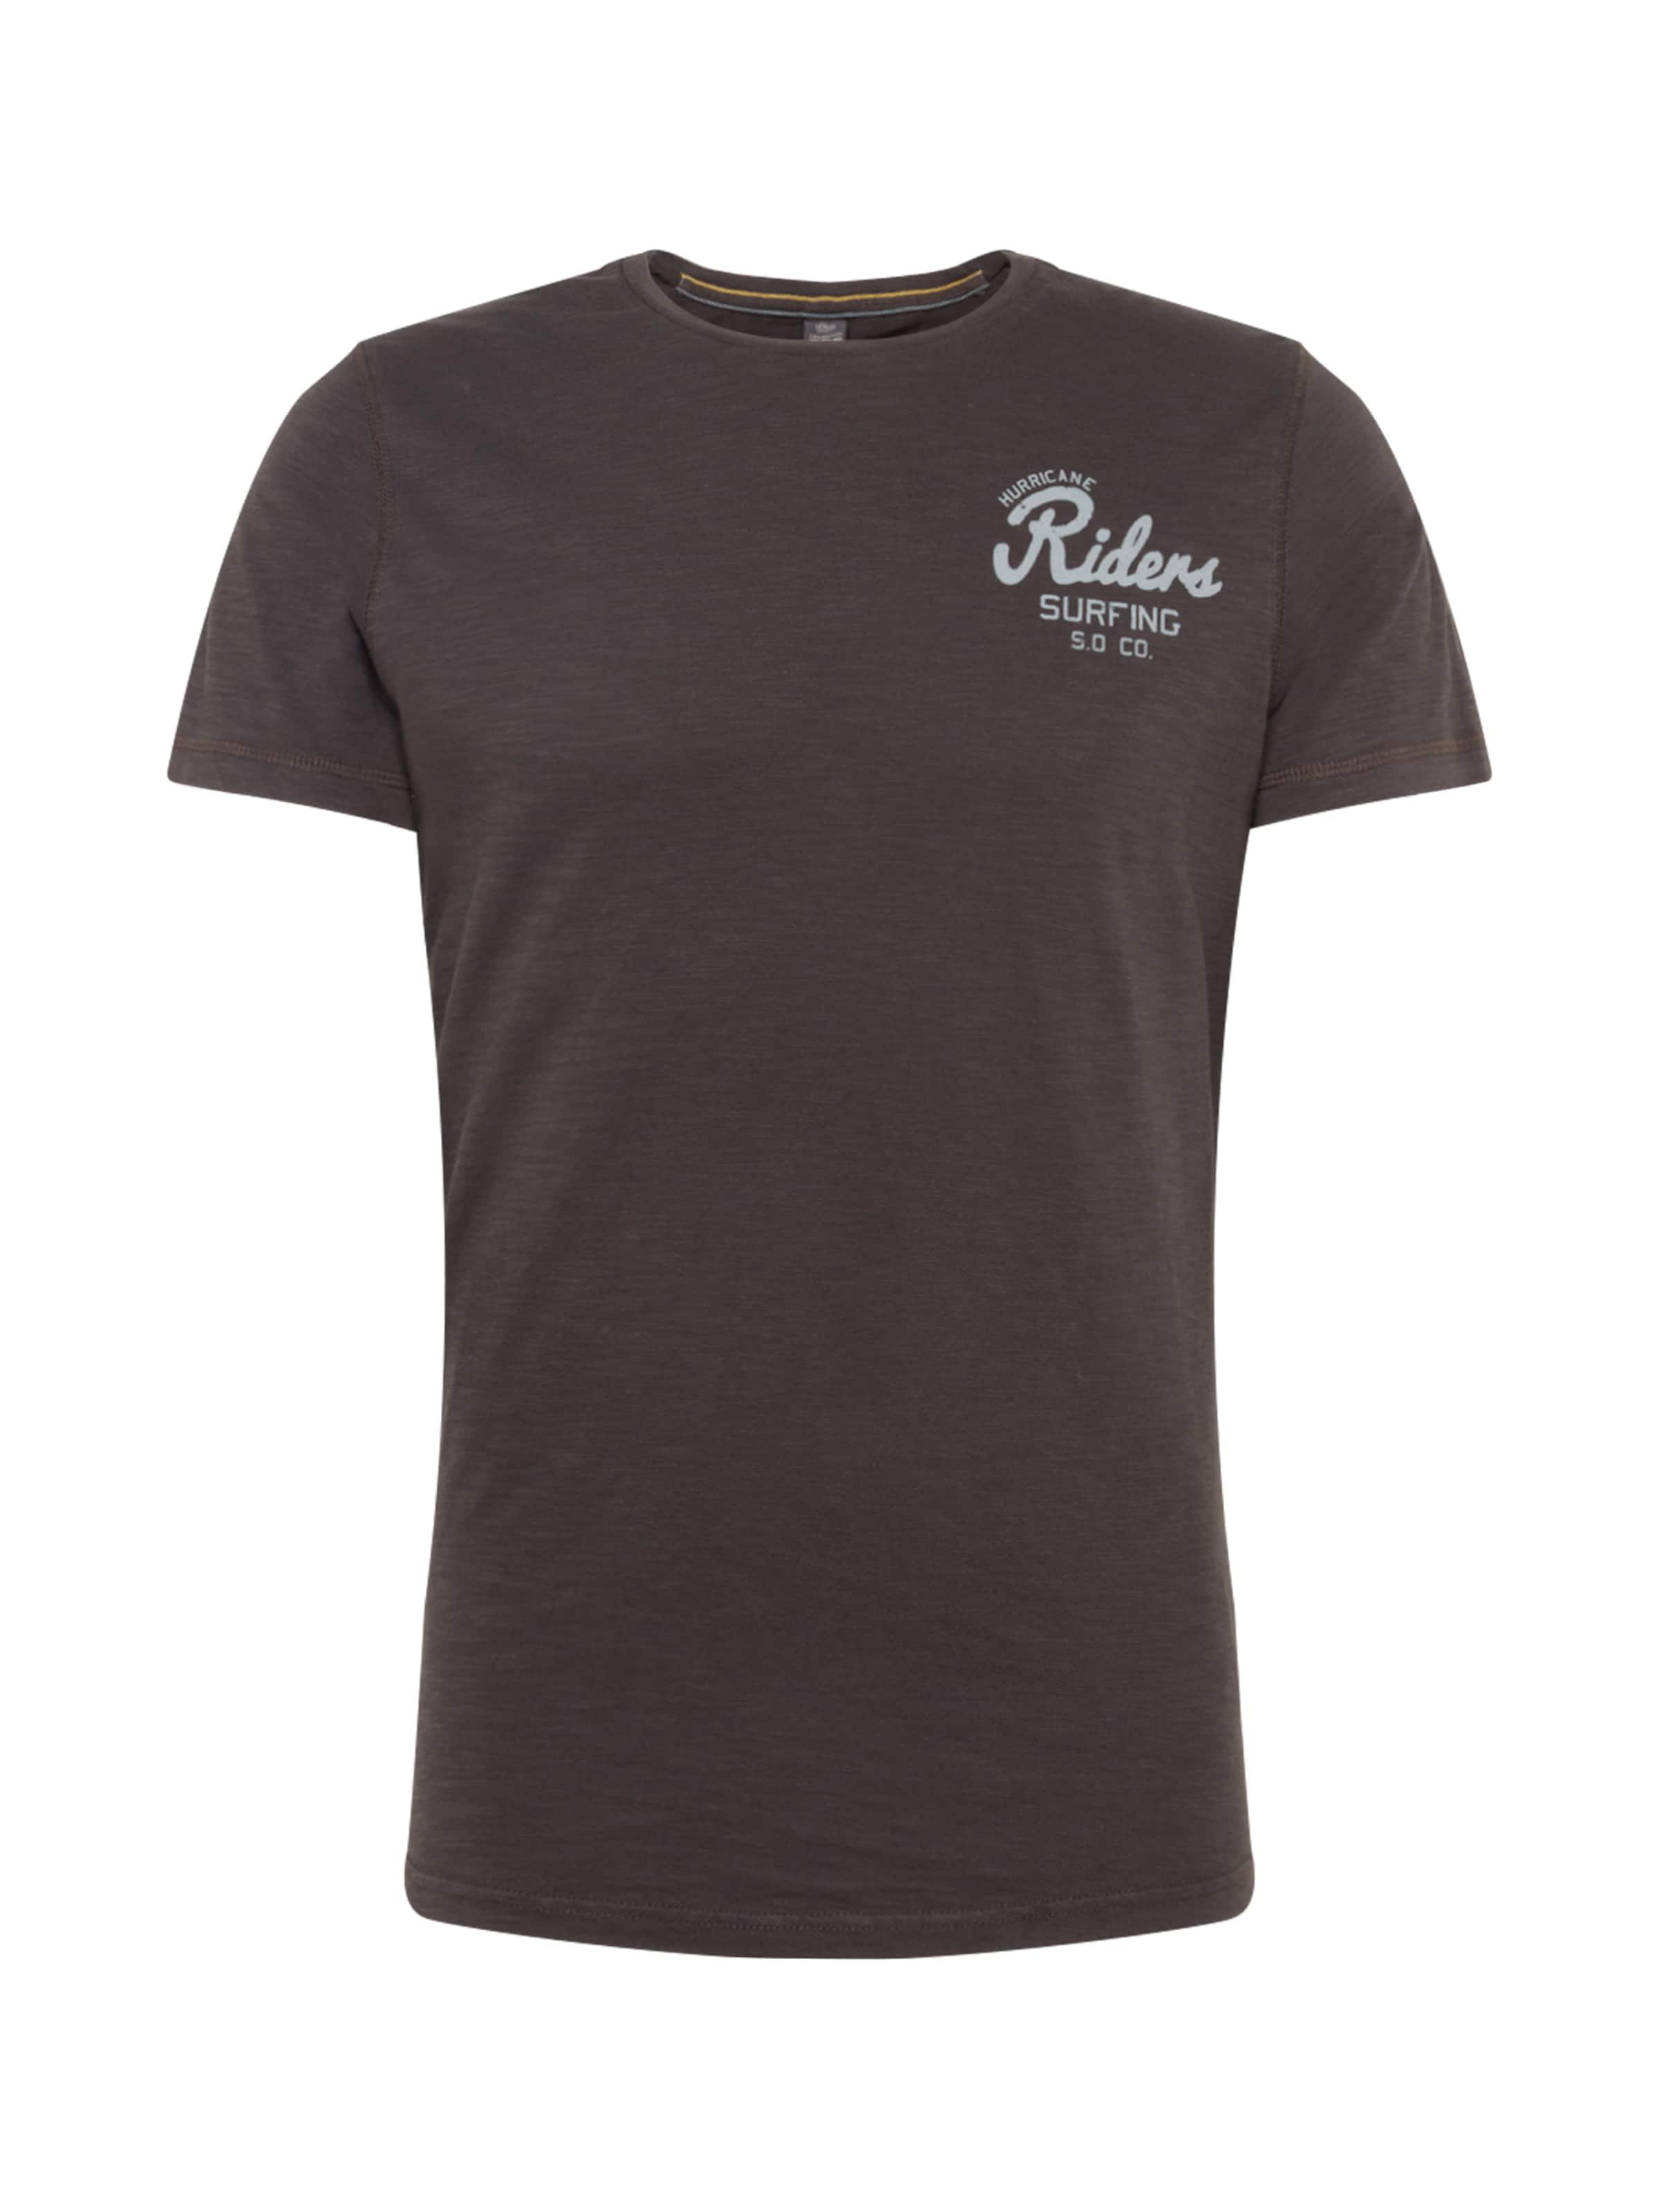 Label T En shirt Foncé Red Vert oliver S uFKc3TlJ1